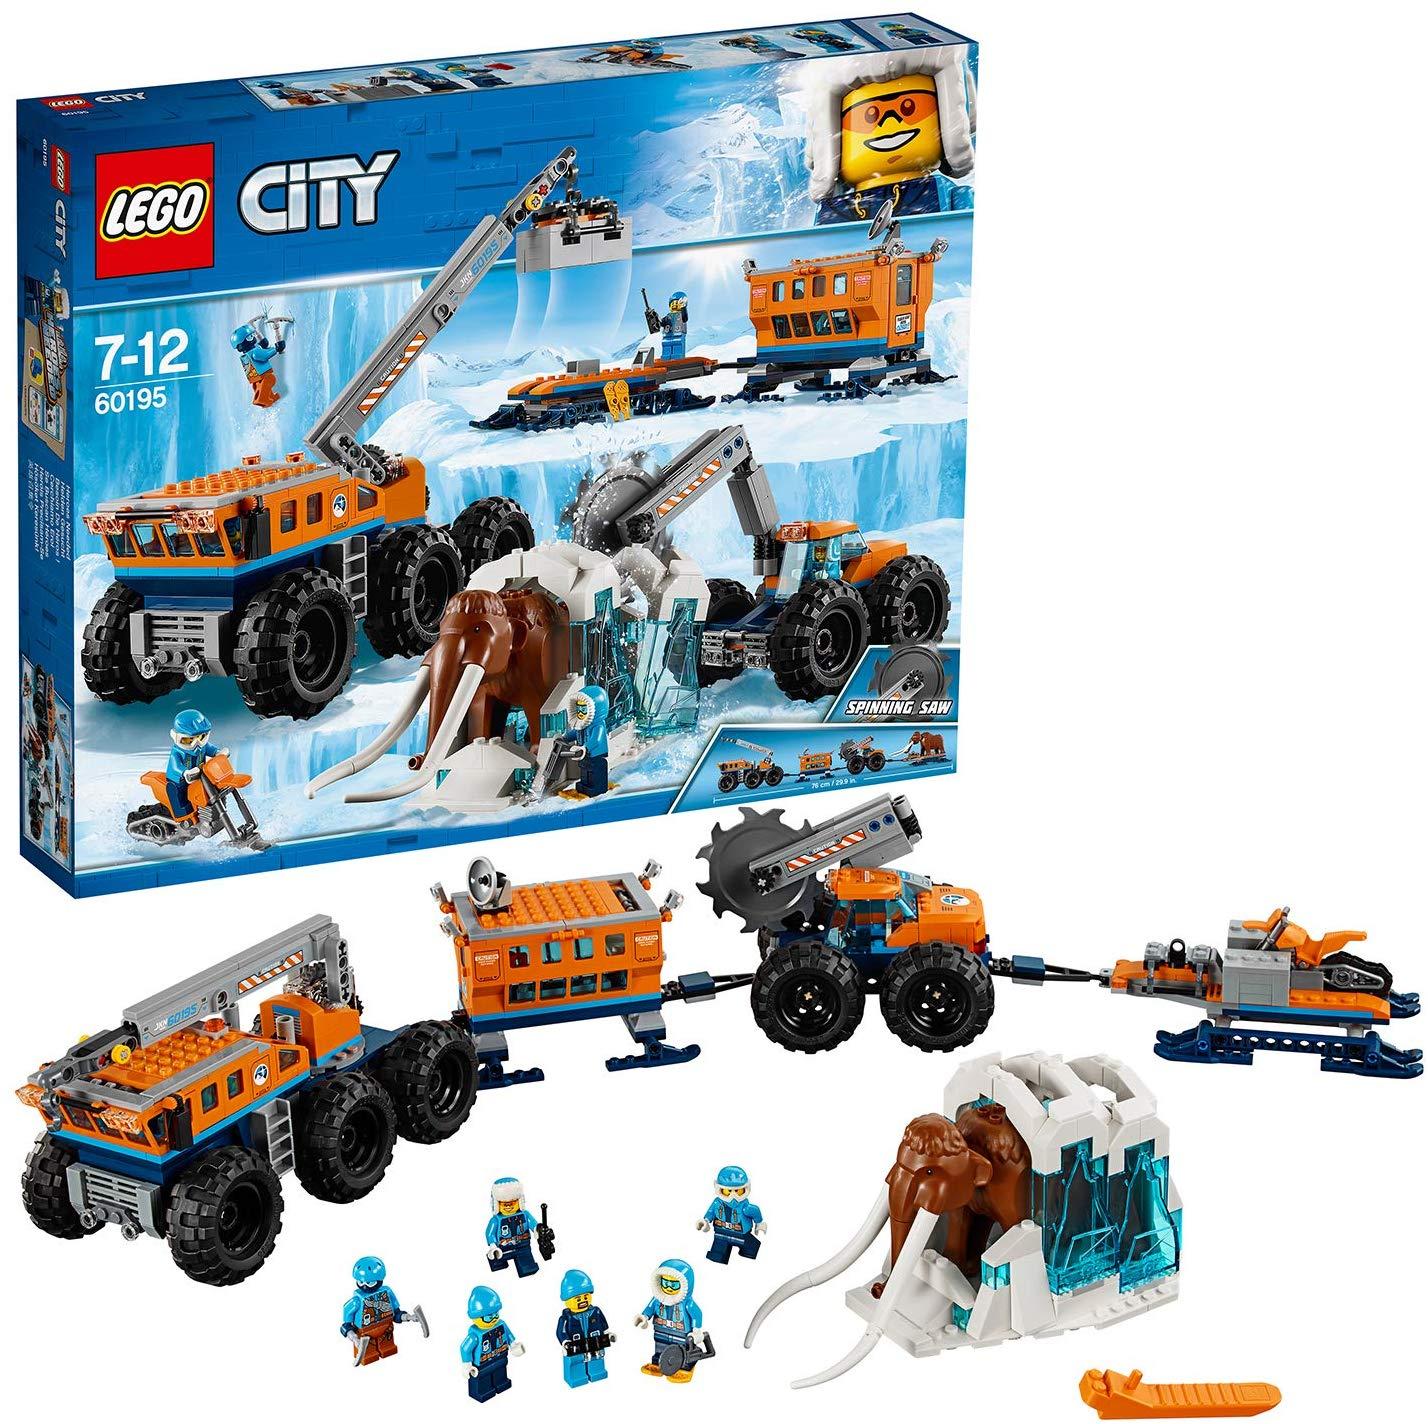 LEGO City 60195 Mobile Arktis-Forschungsstation [Amazon UK]